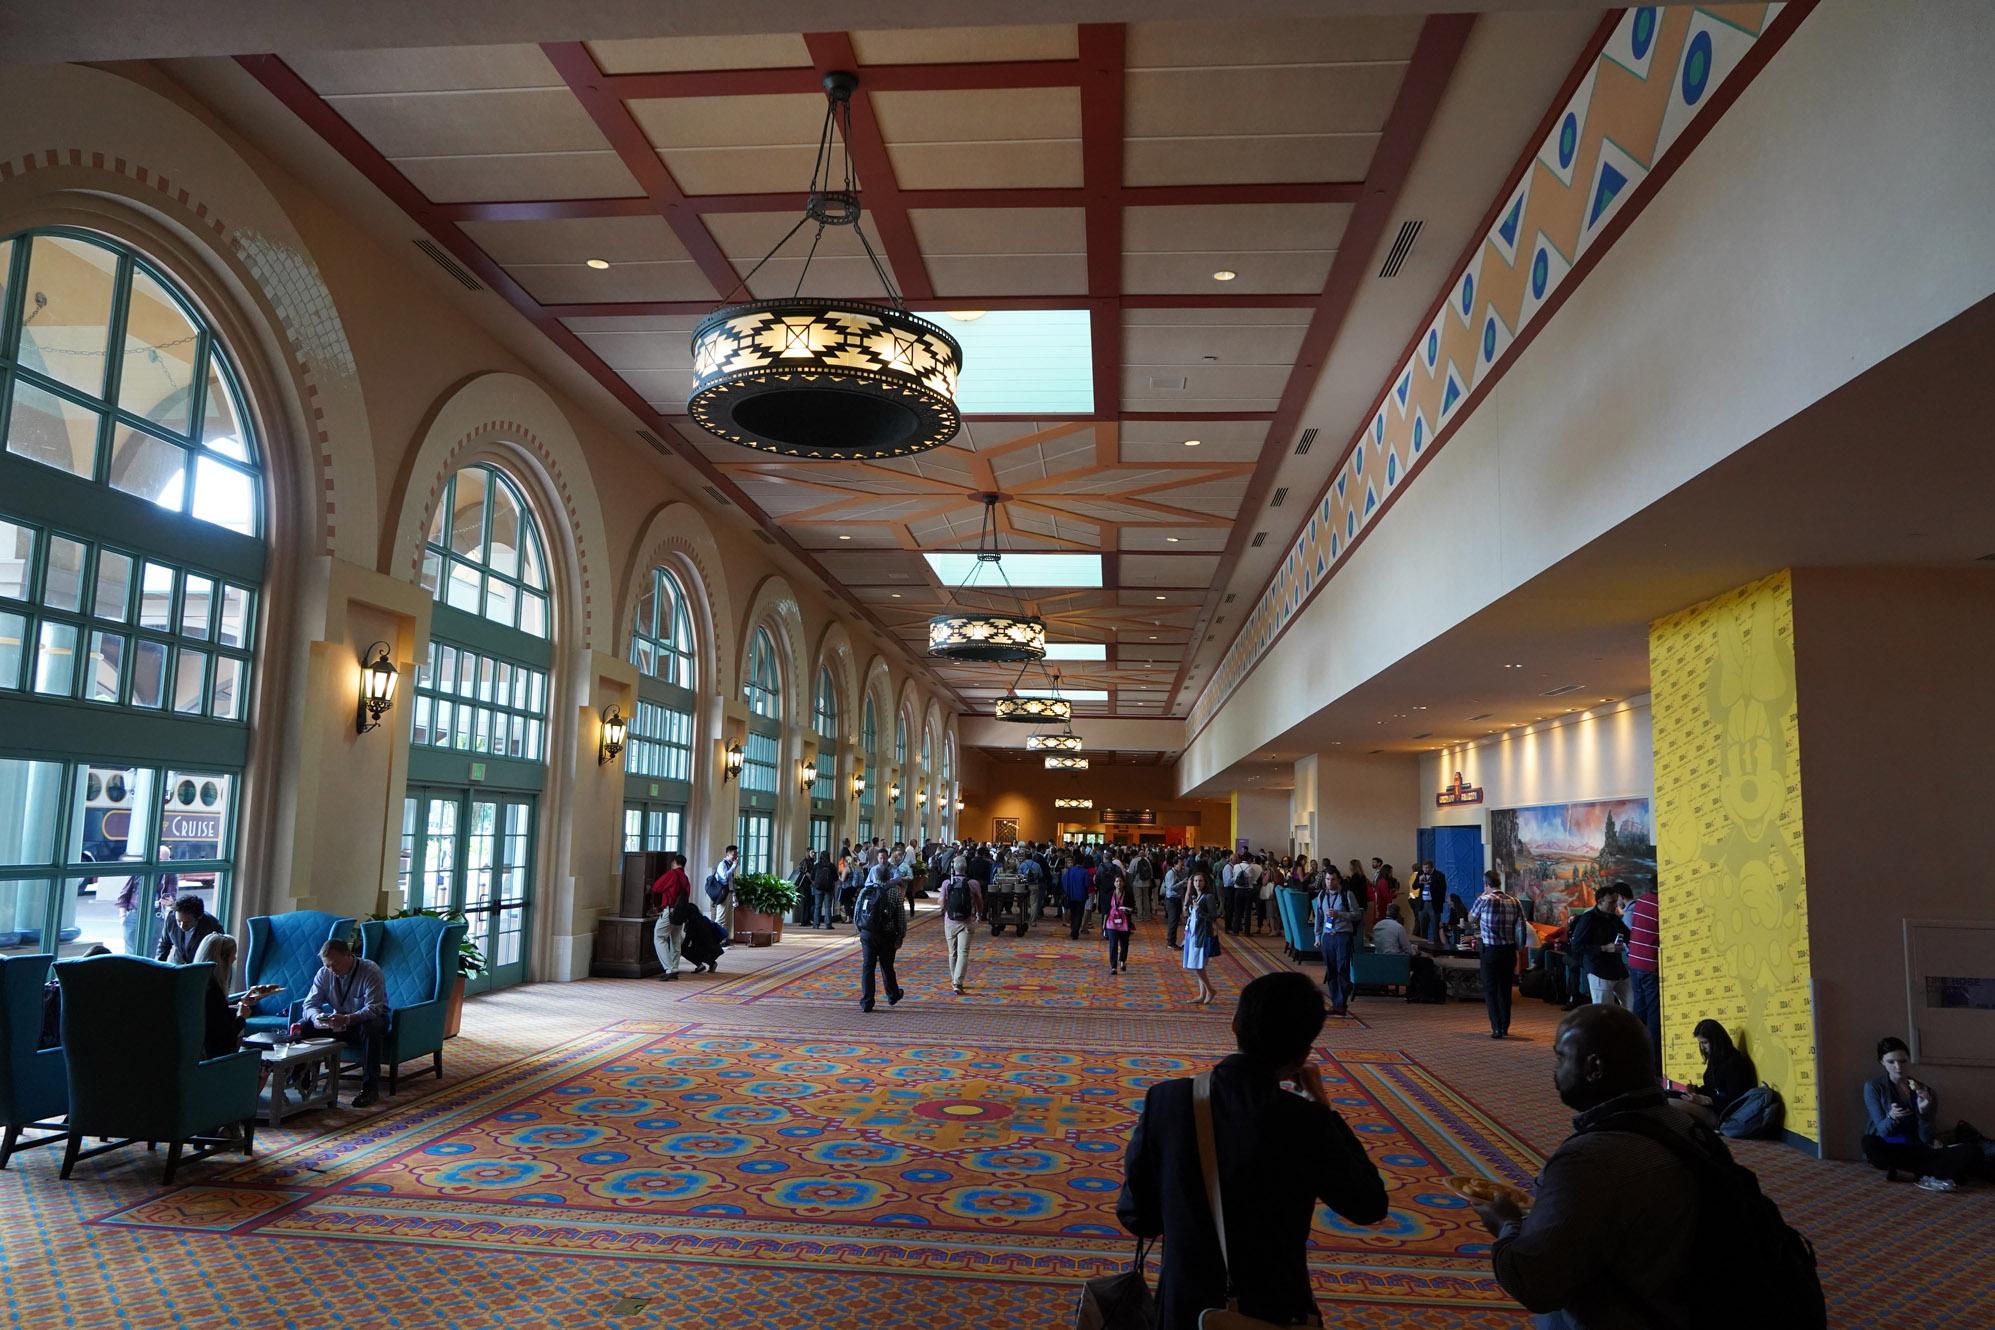 Disney moderate hotels